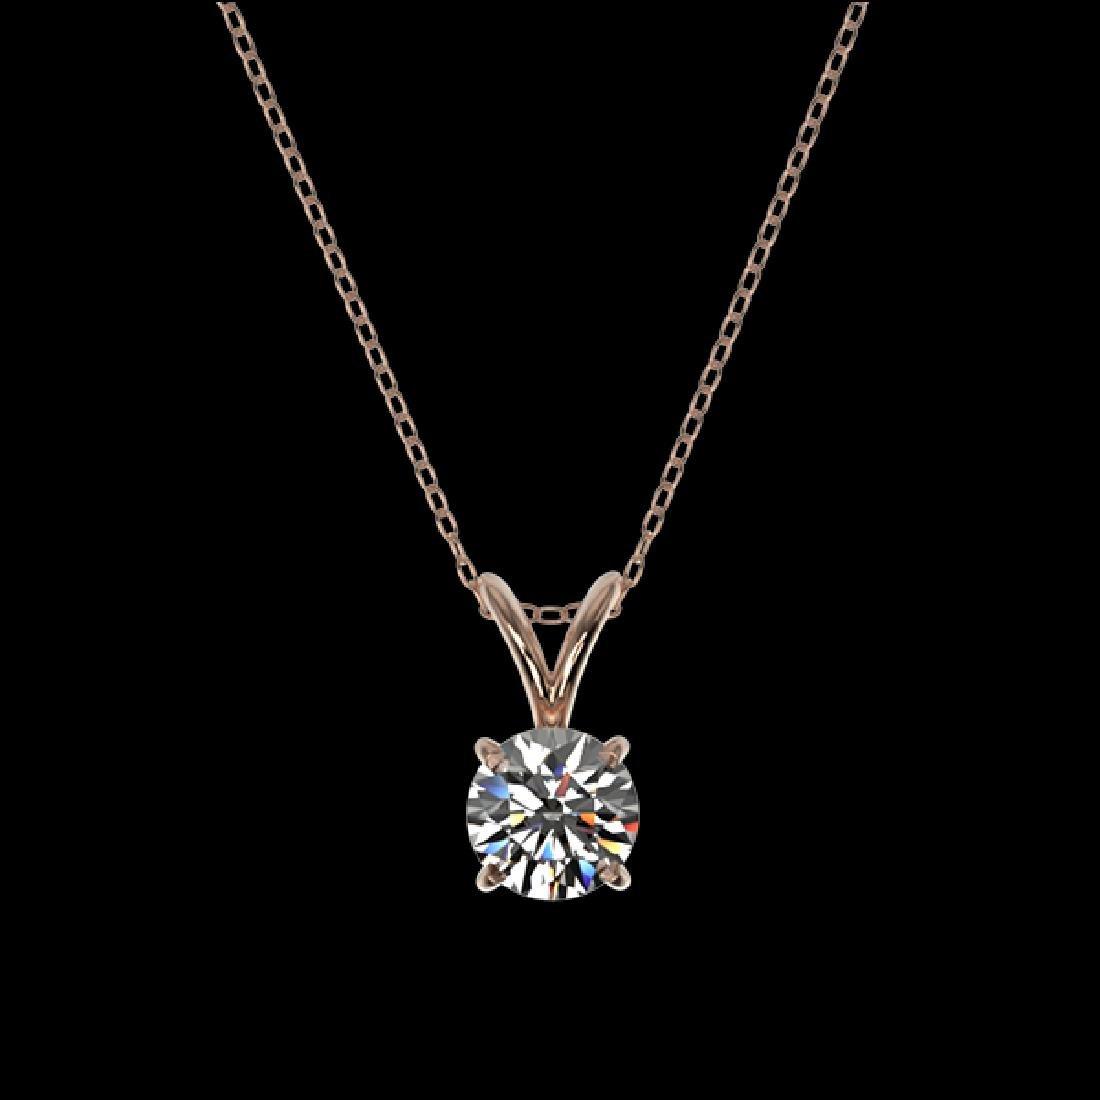 0.51 CTW Certified G-Si Quality Diamond Bridal - 3